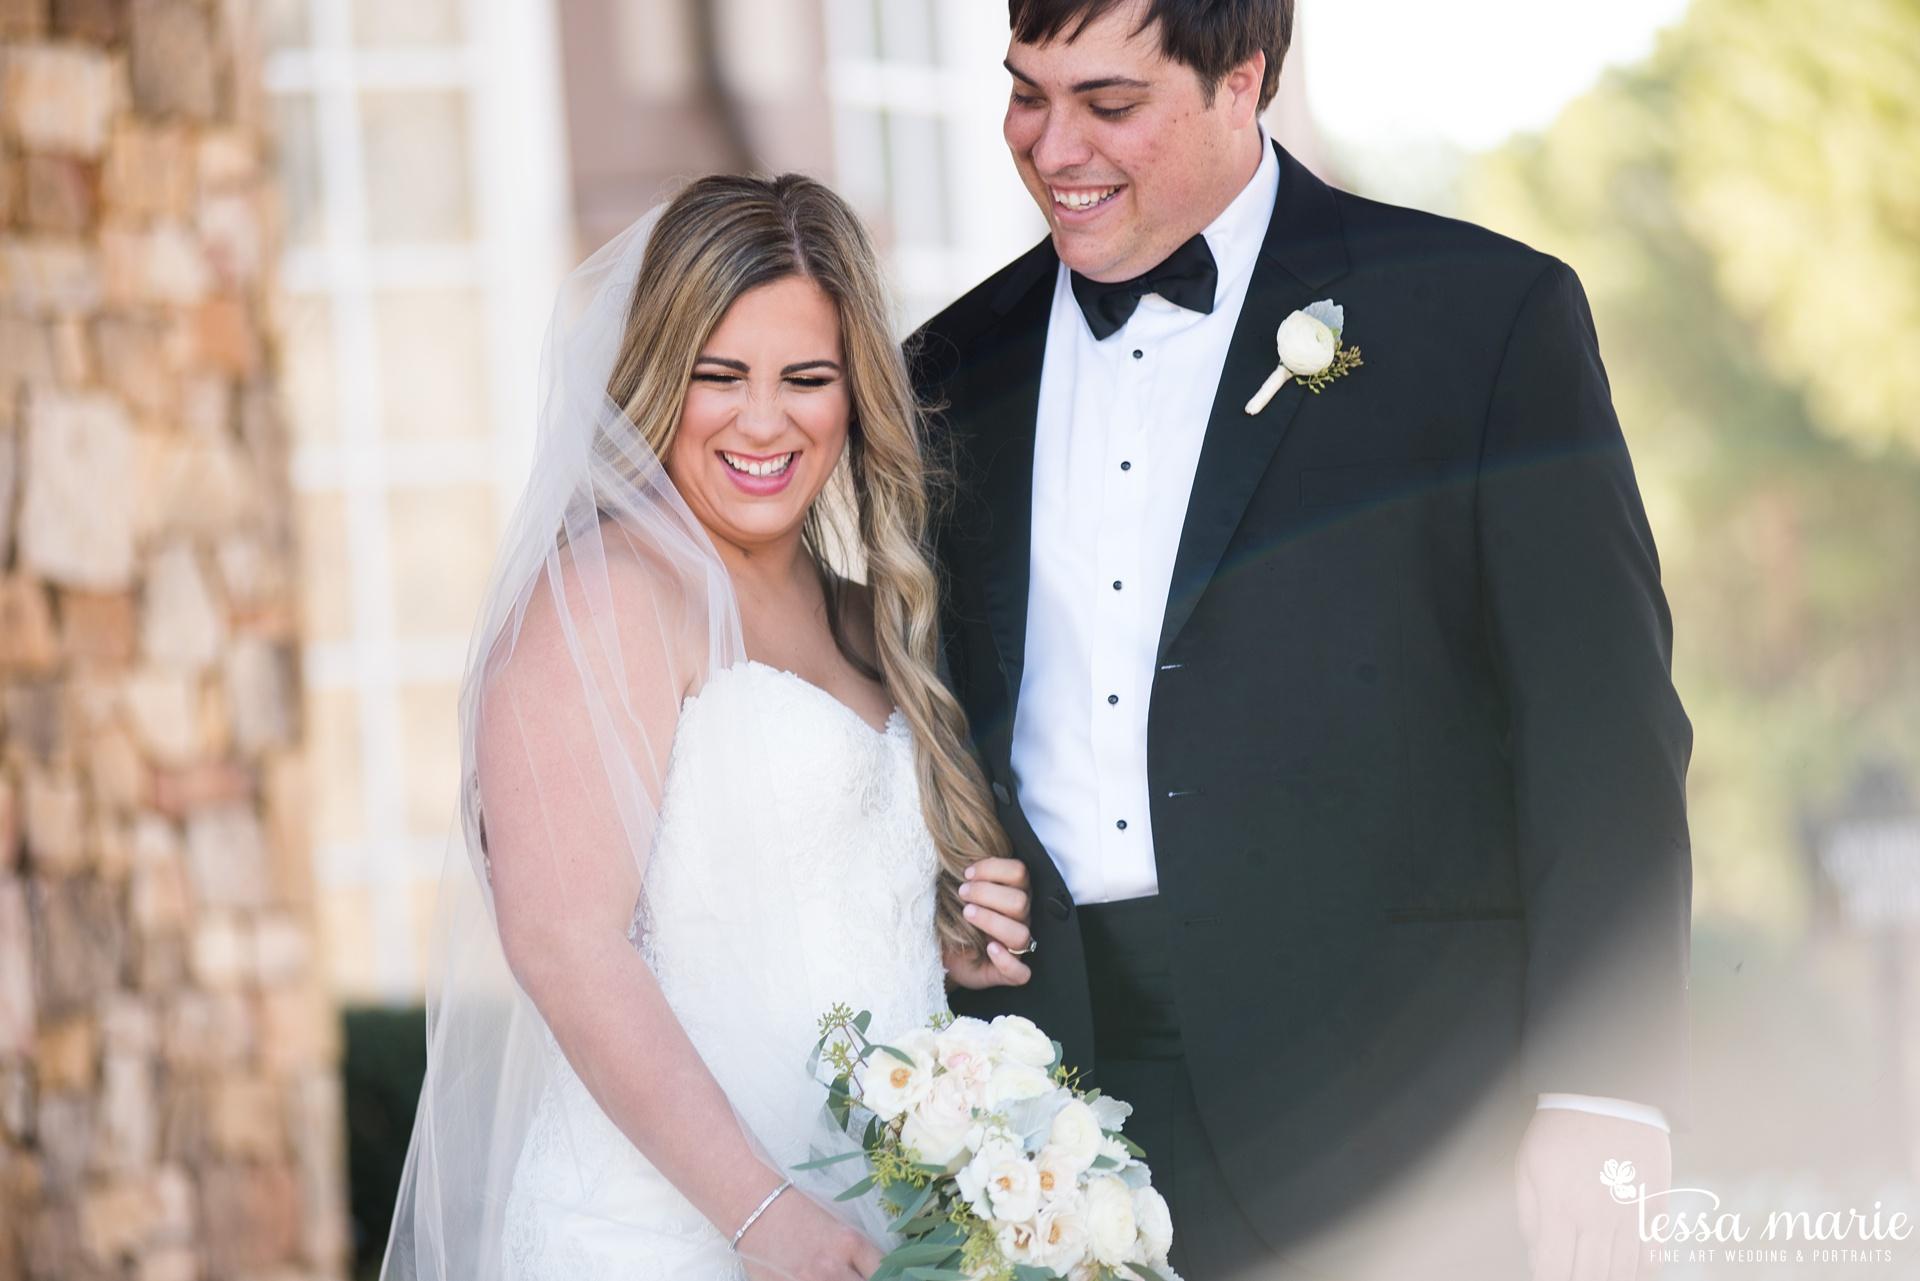 tessa_marie_legacy_moments_storytelling_candid_emotionally_driven_wedding_photographer_atlanta_wedding_photography_st_ives_country_club_wedding_boukates_bridals_by_lori_0014